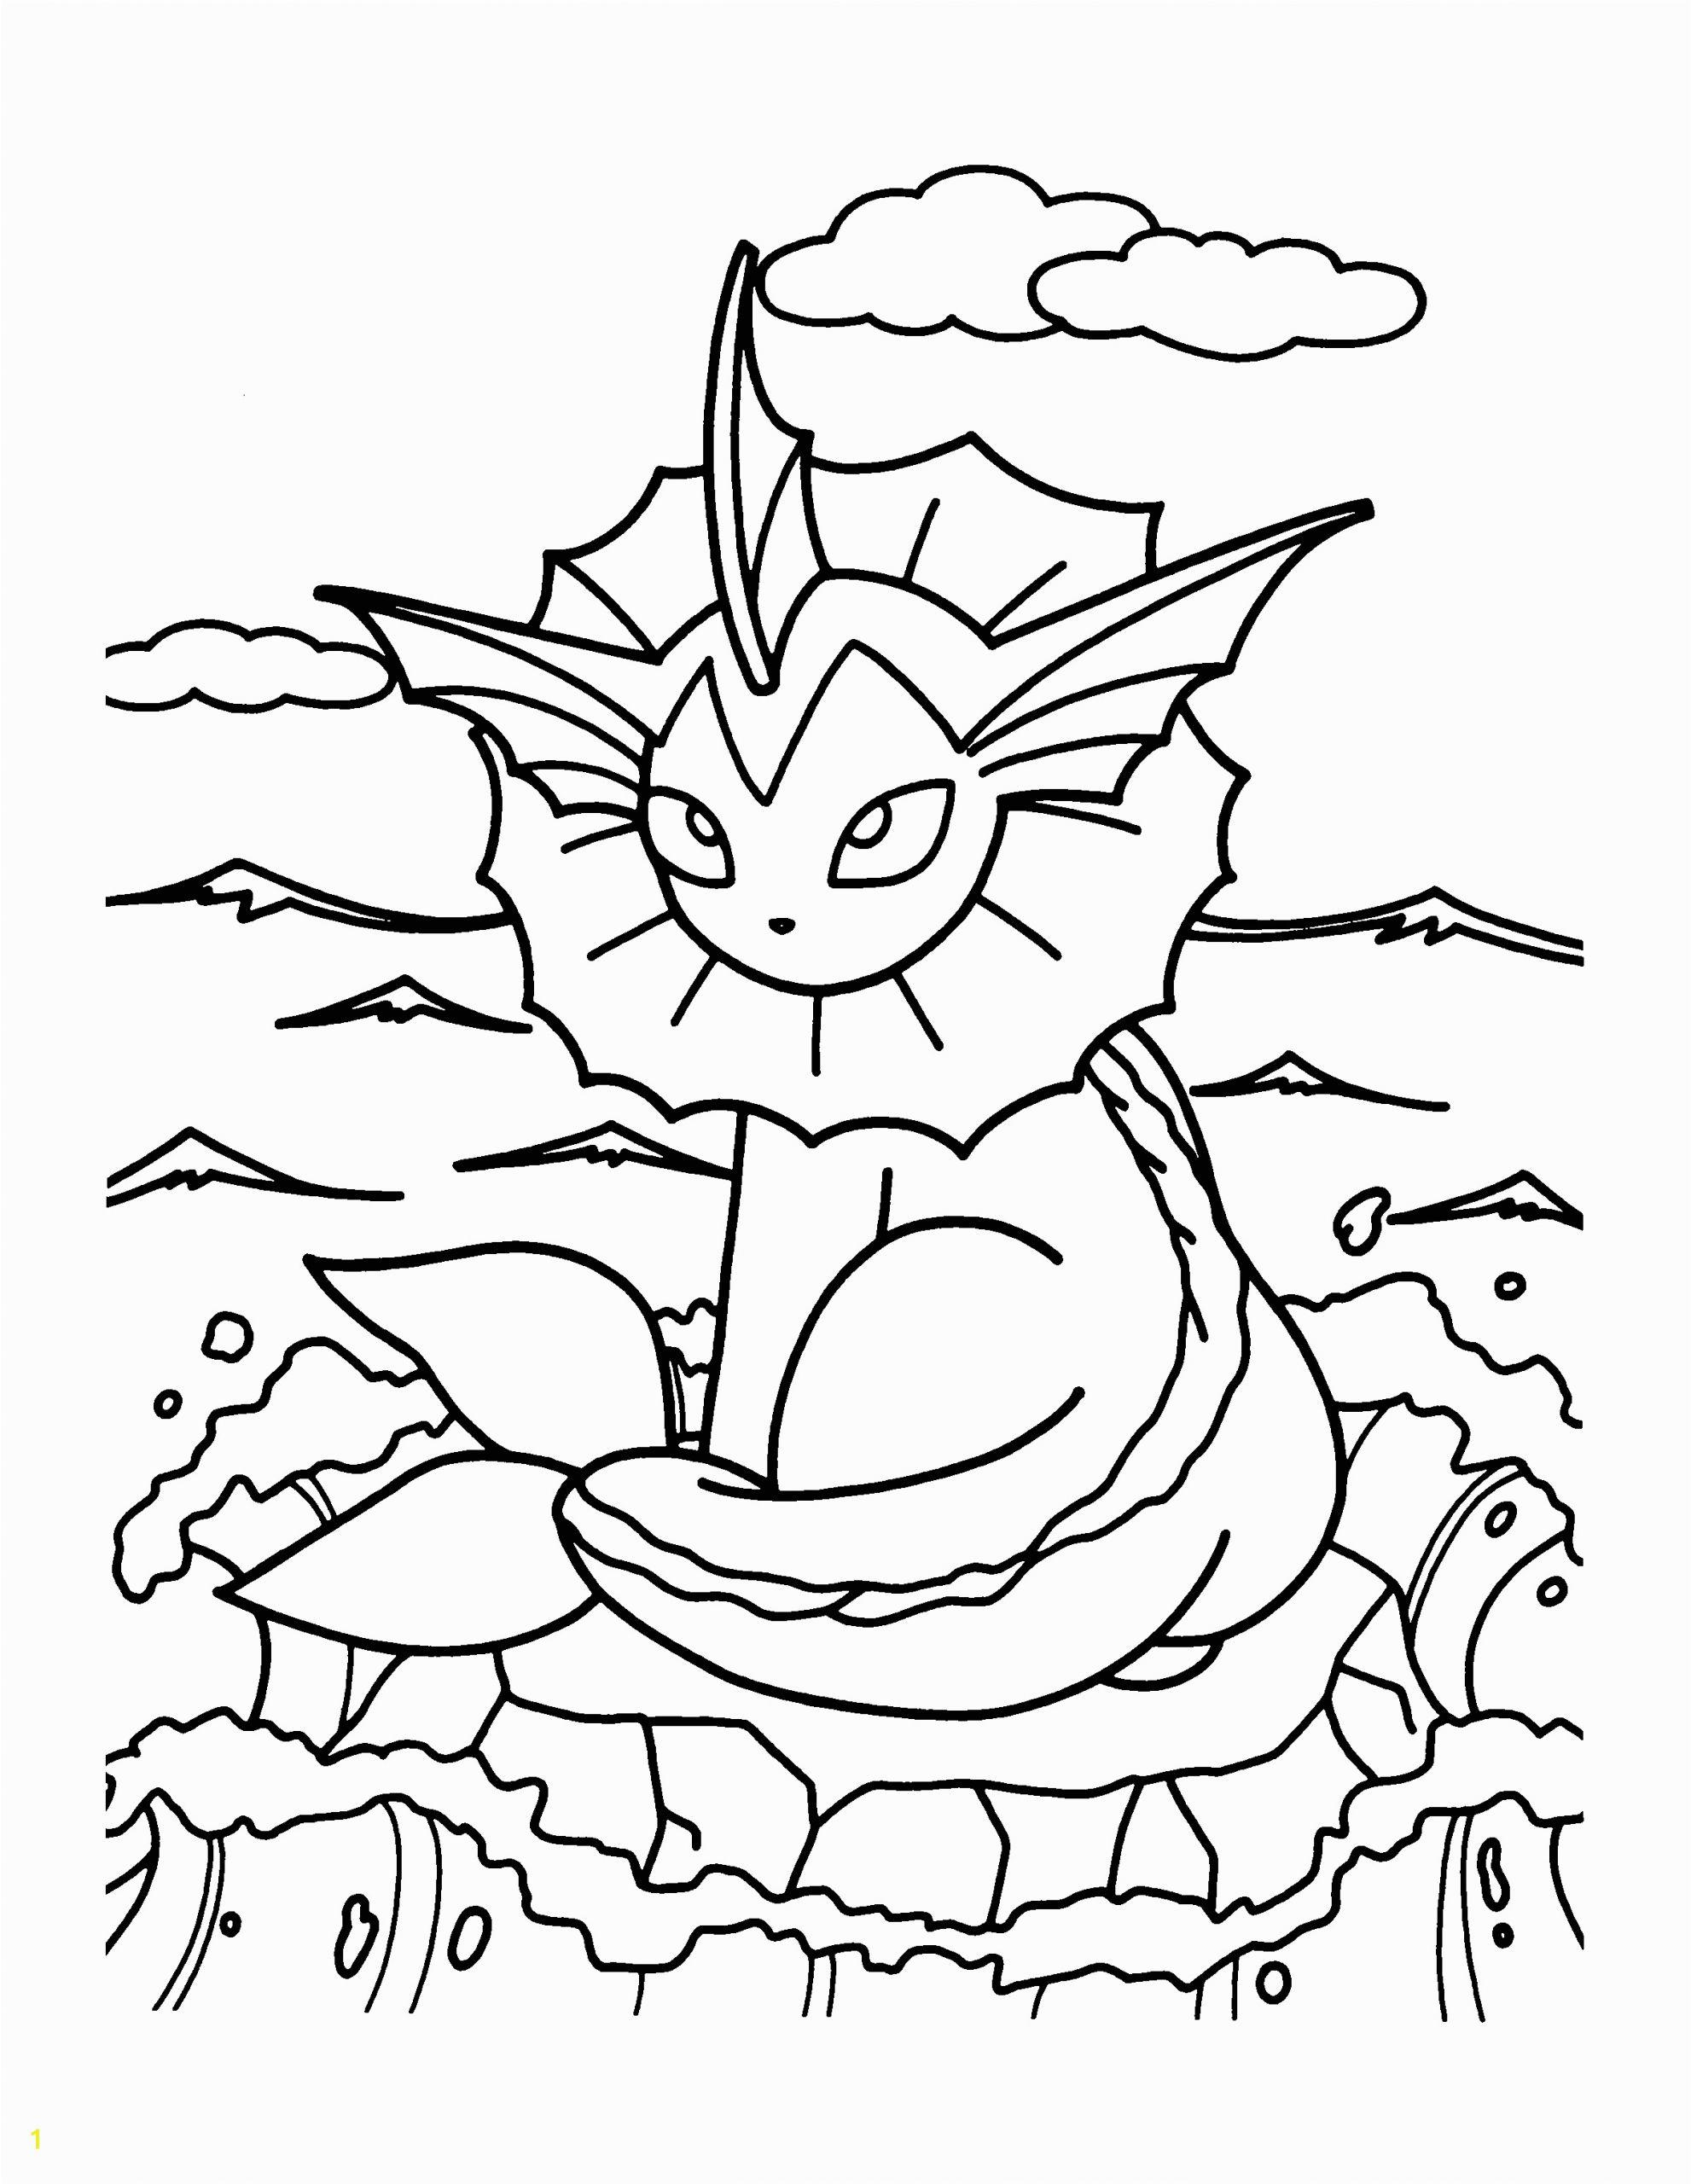 Mewtwo Pokemon Coloring Pages | divyajanani.org